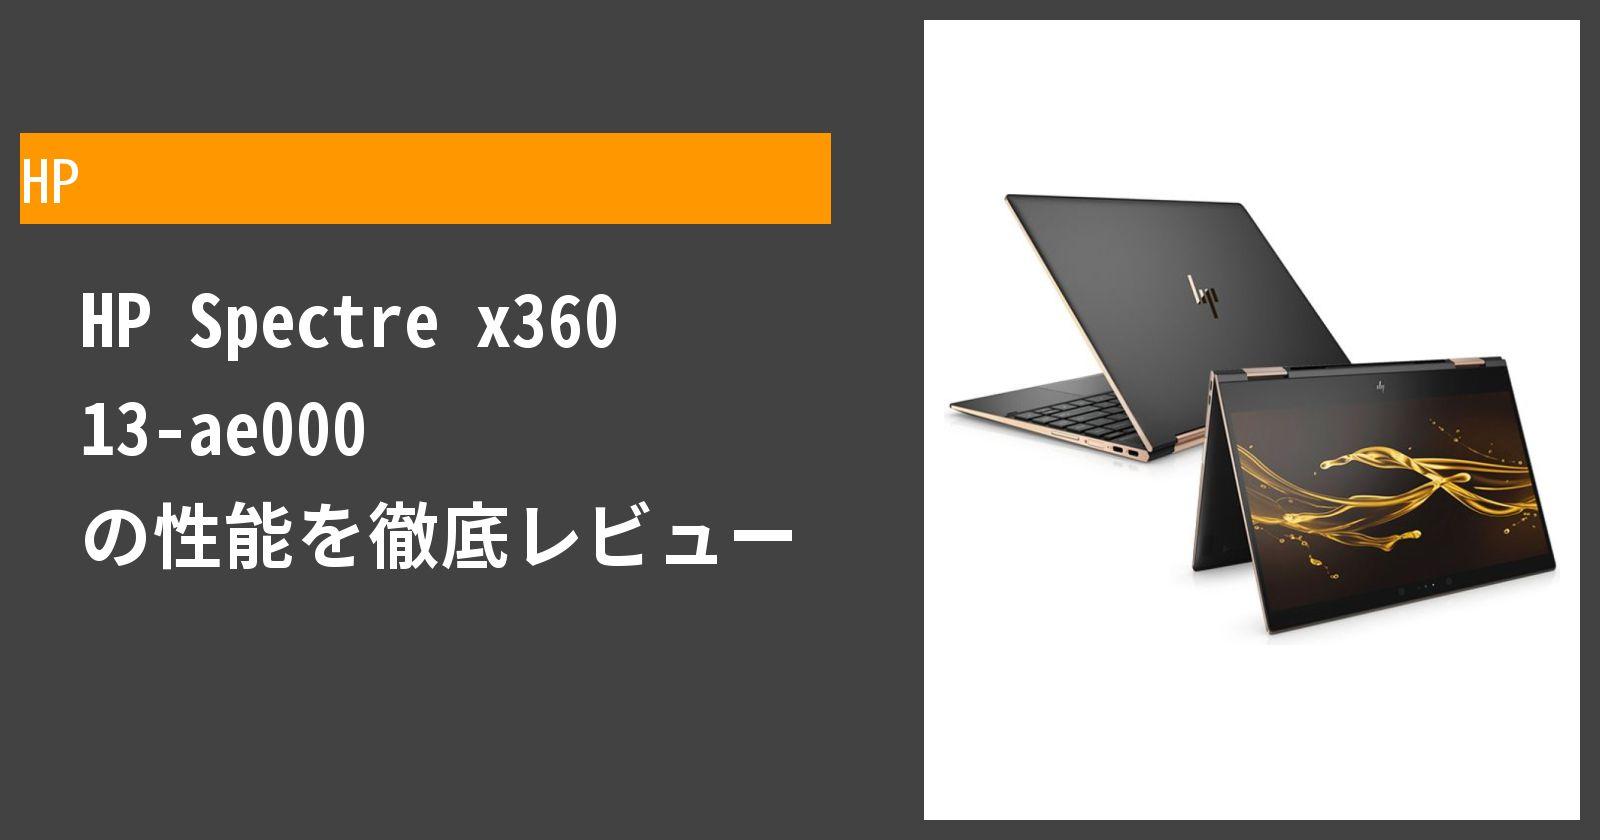 HP Spectre x360 13-ae000 の性能を徹底レビュー